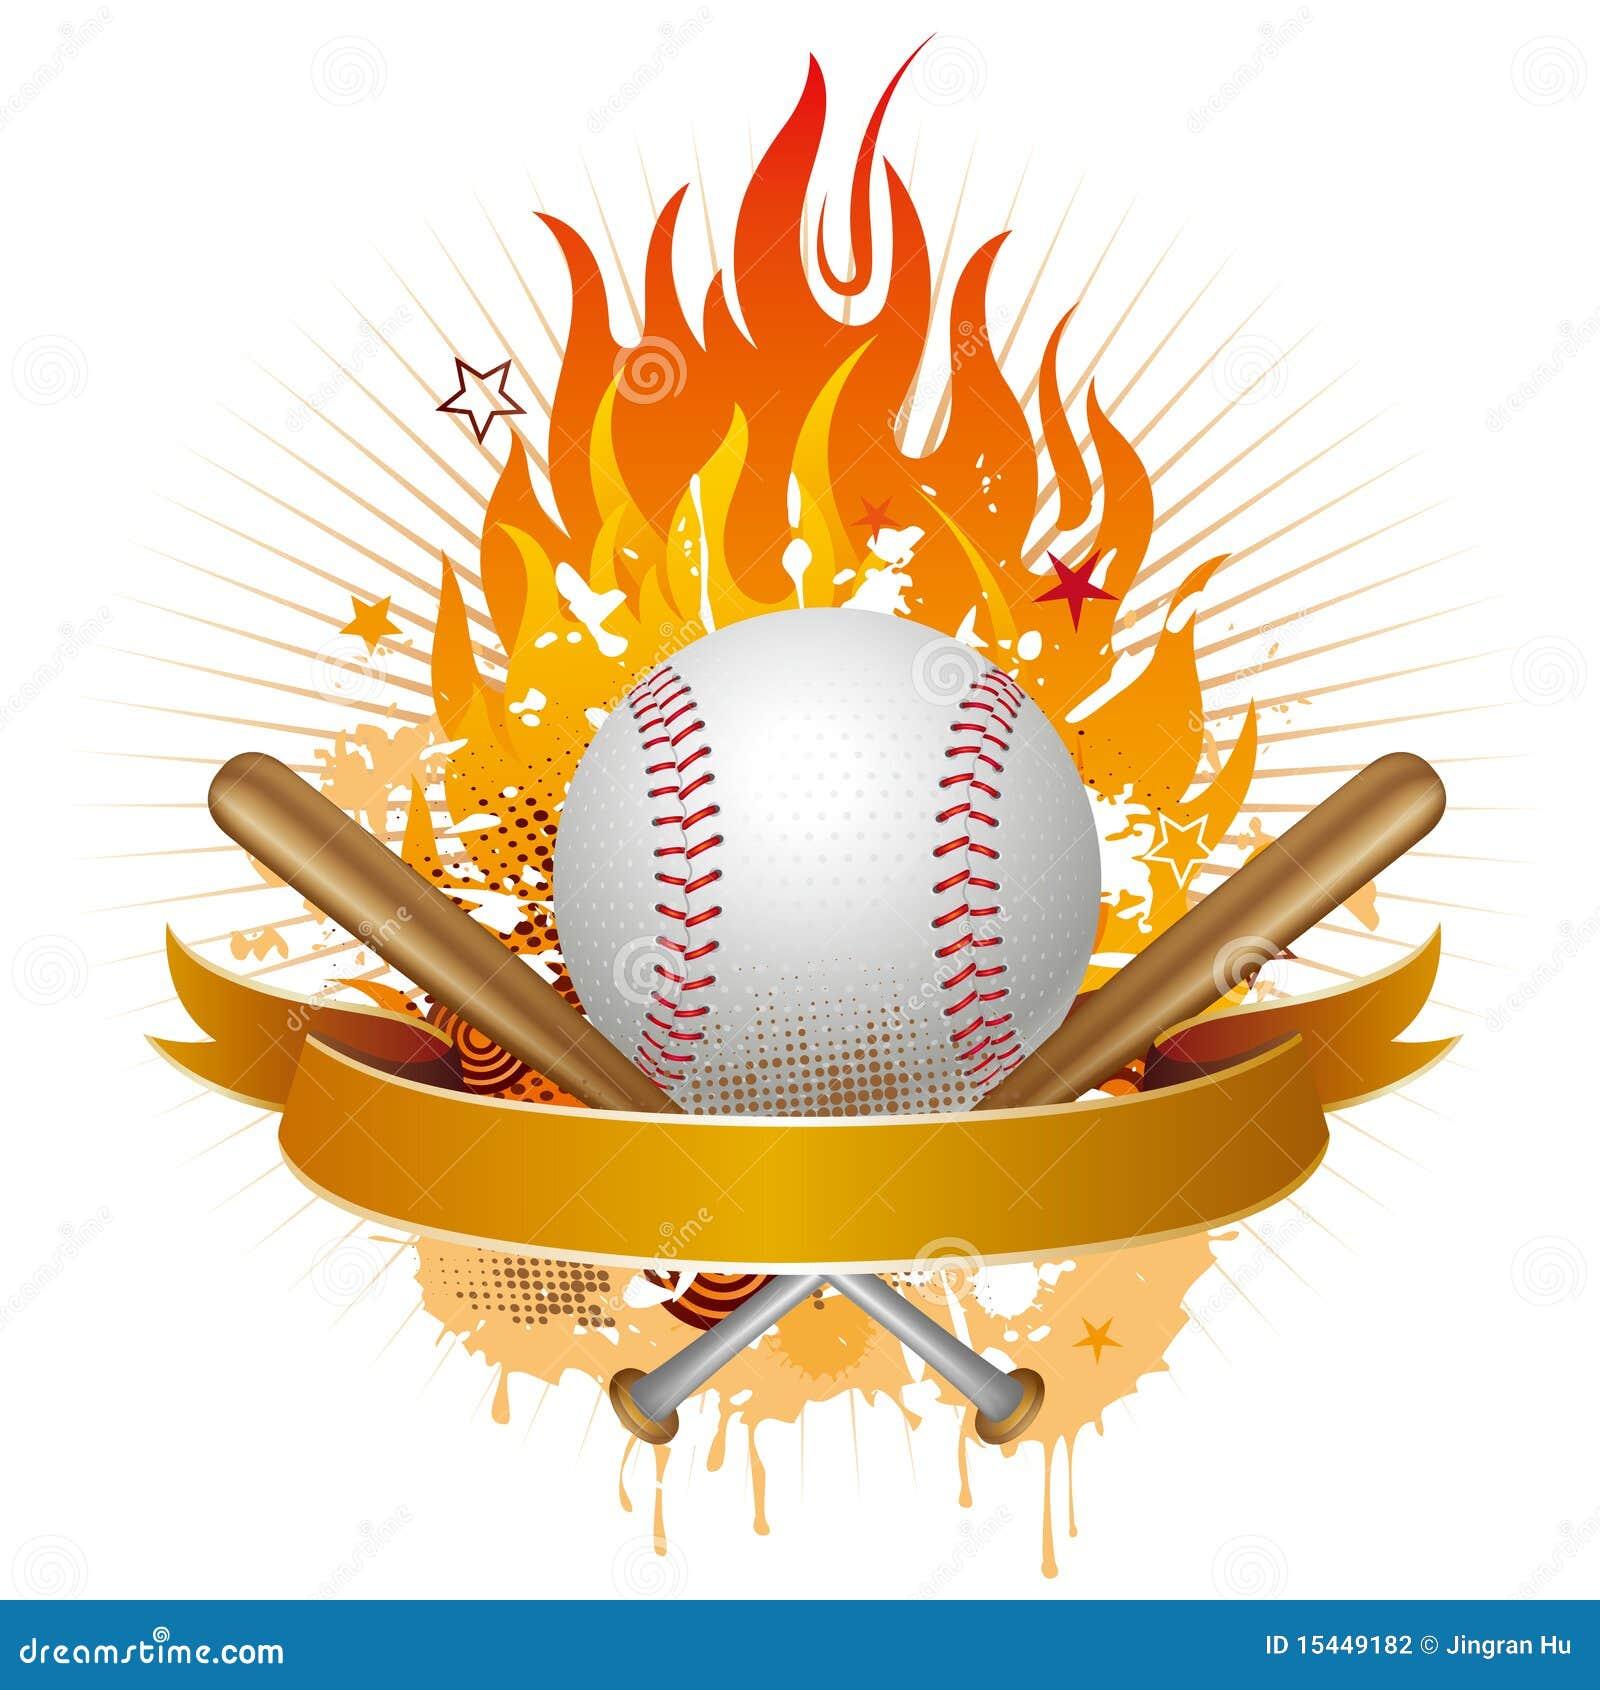 Baseball With Flames Stock Photography Image 15449182